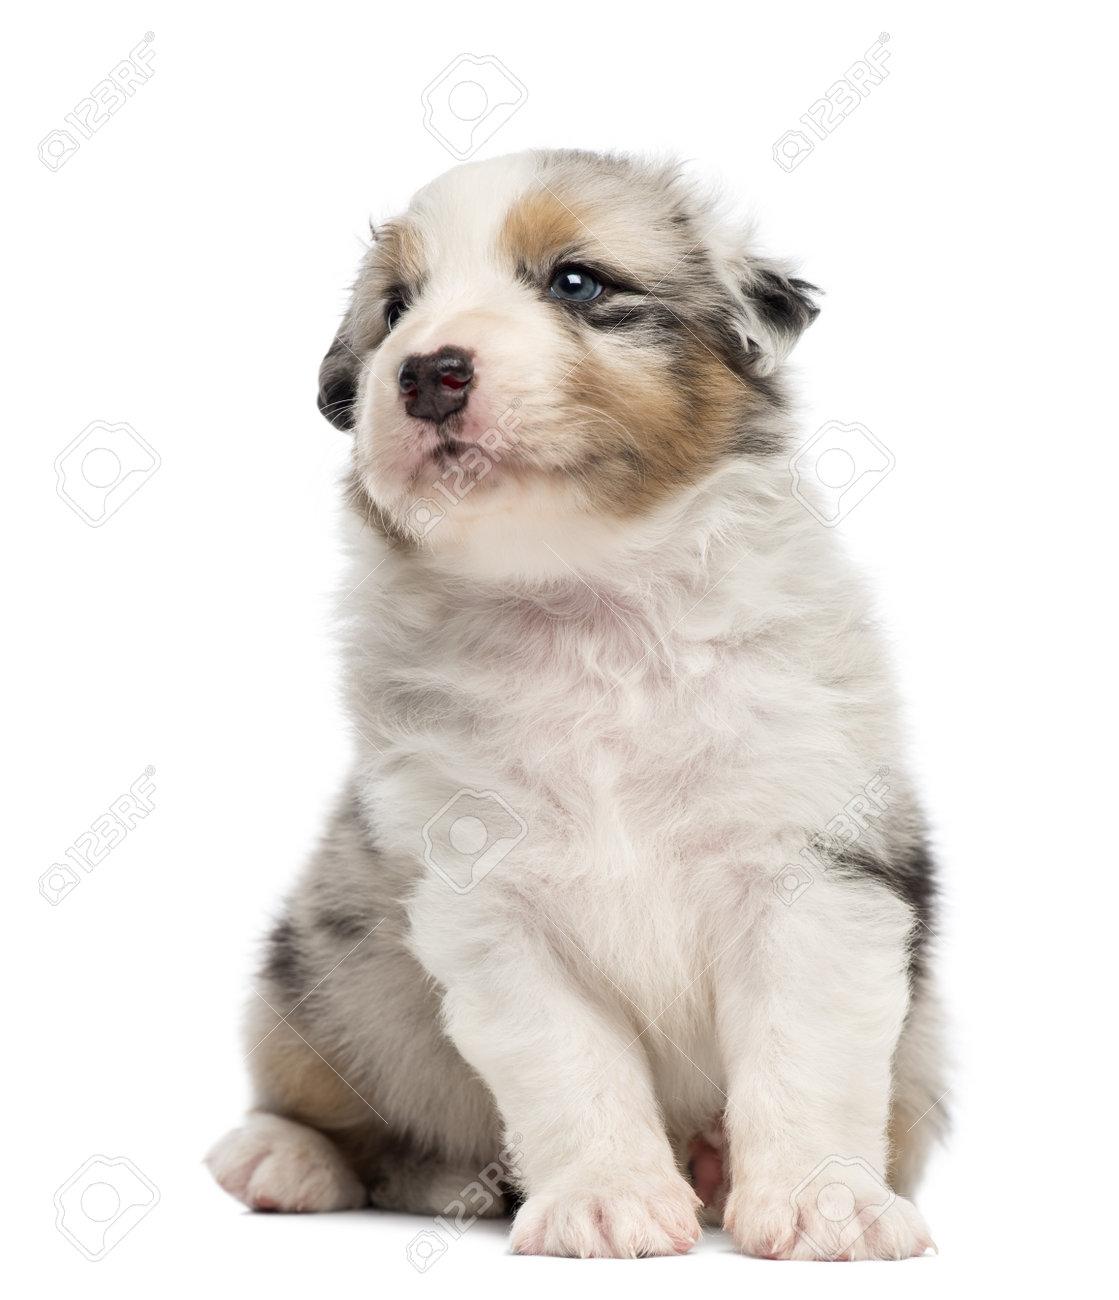 Australian Shepherd puppy, 30 days old, sitting against white background Stock Photo - 16485560